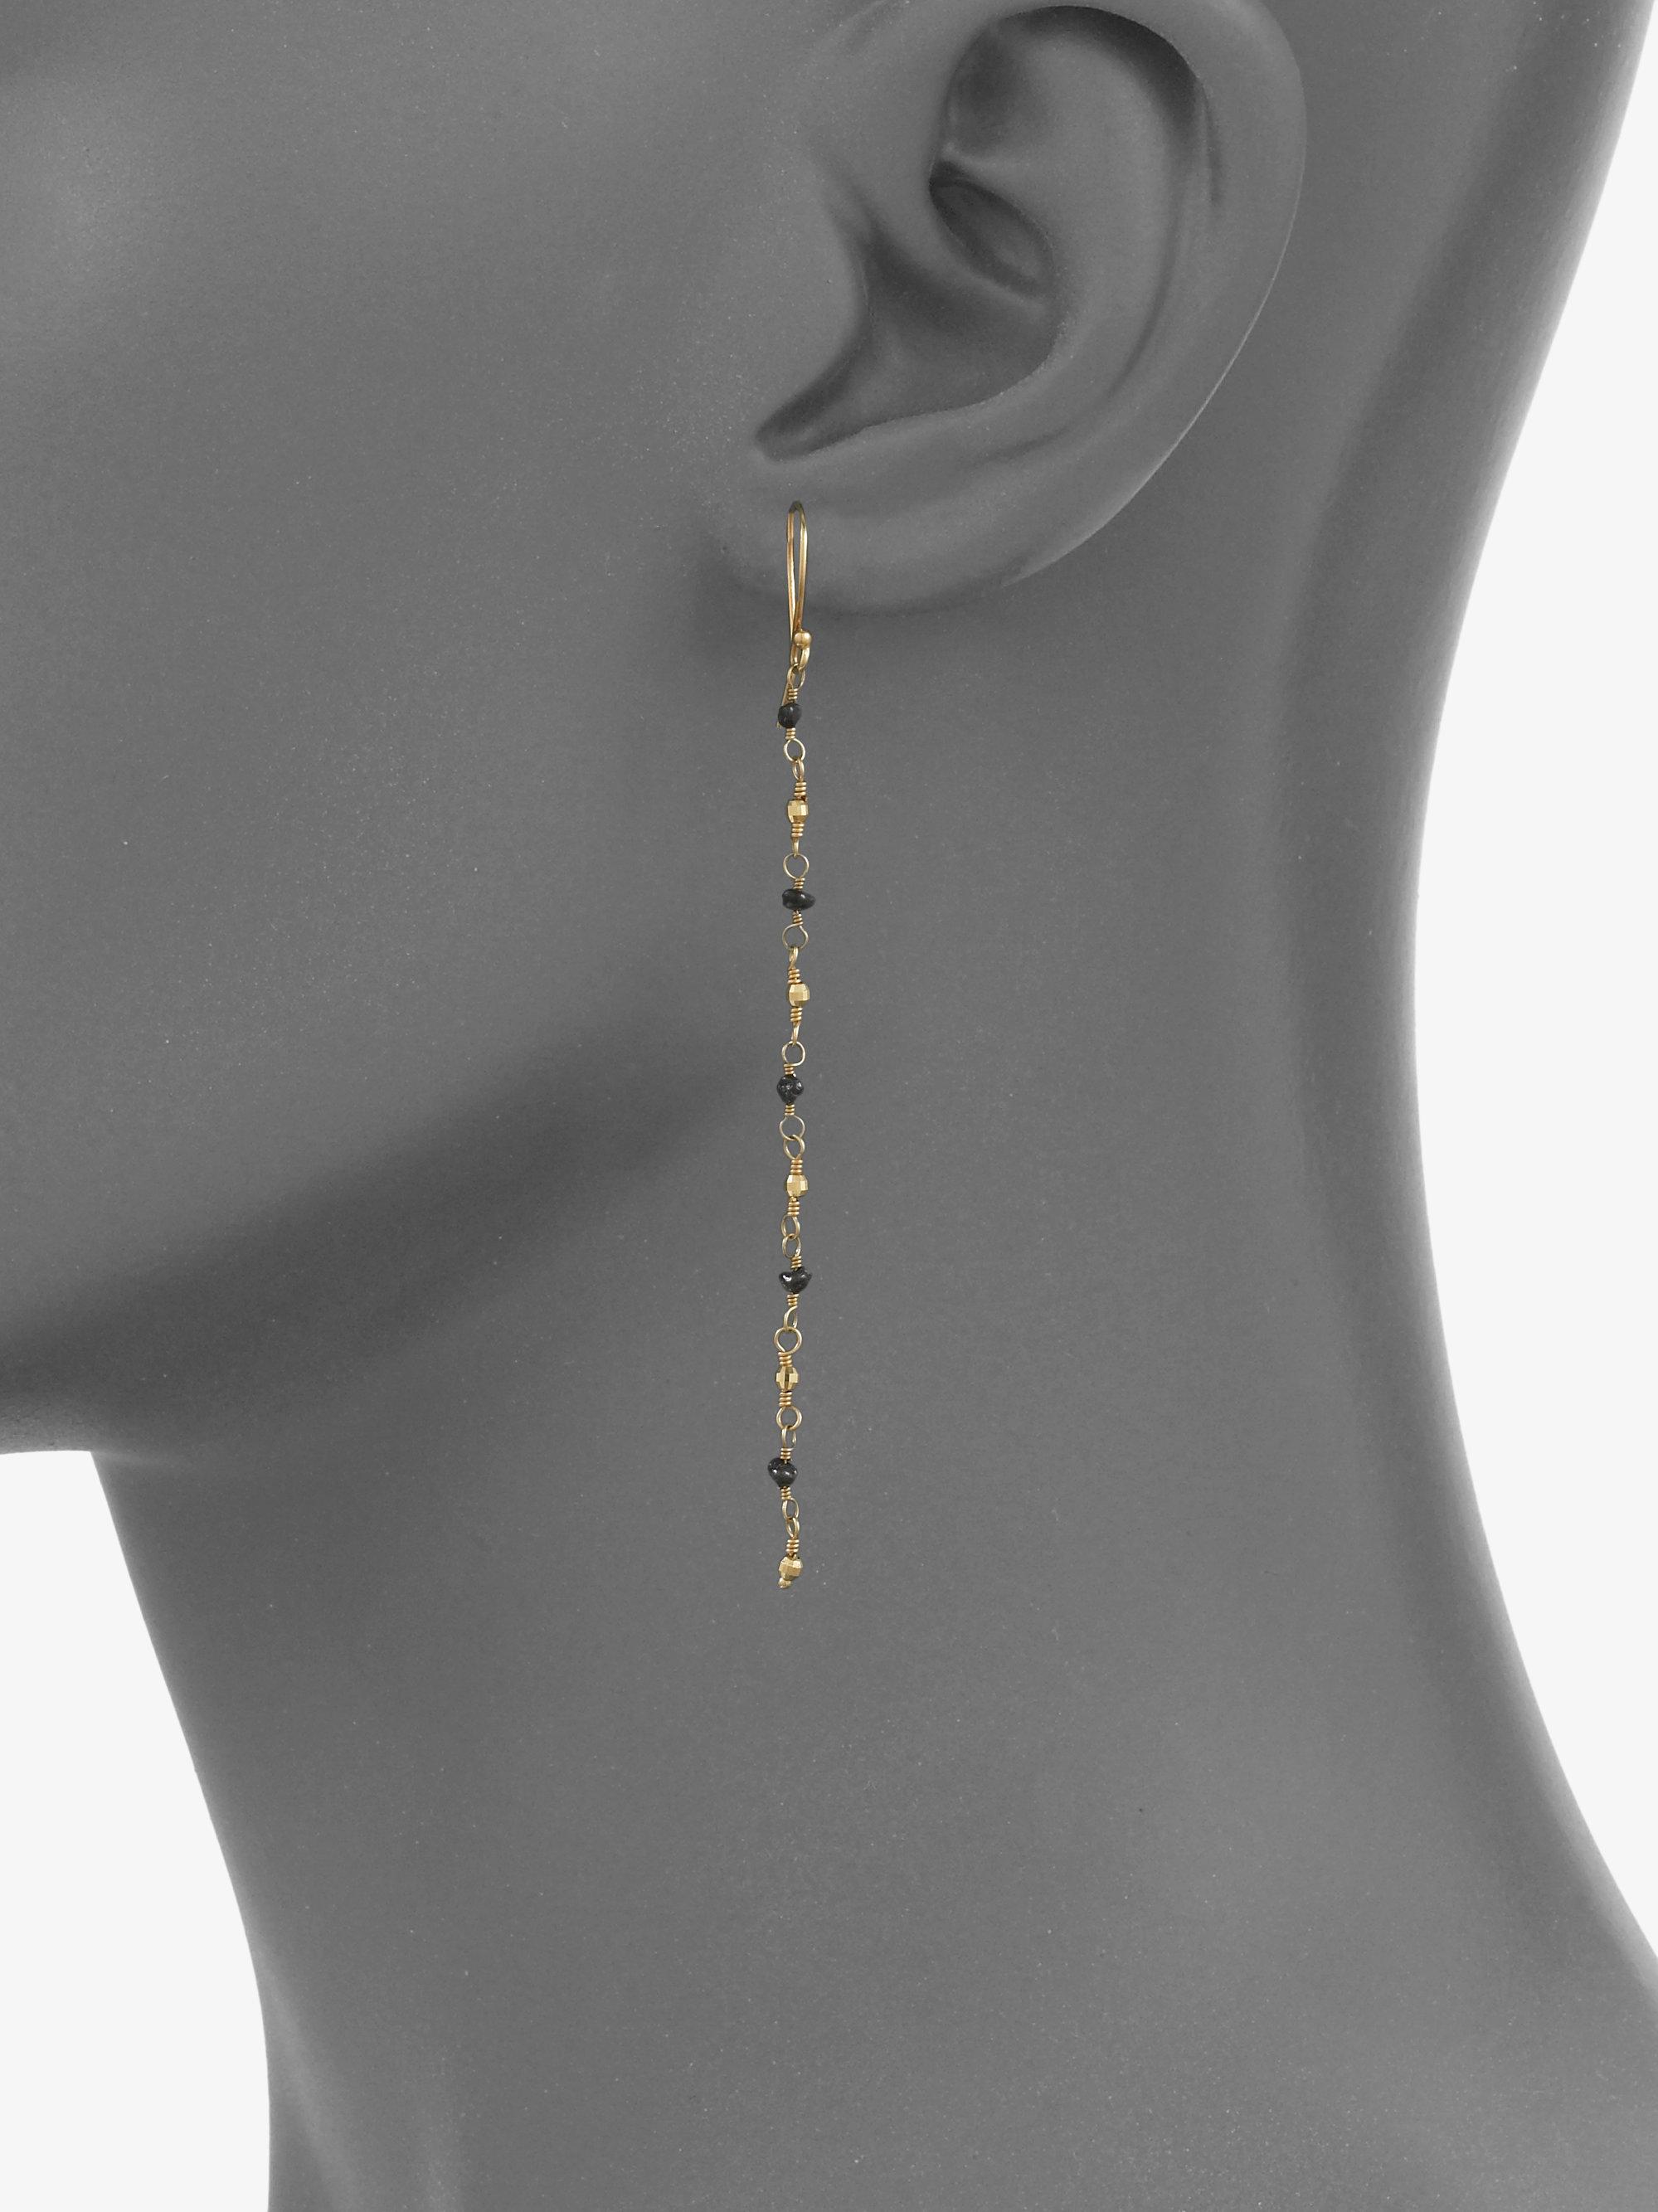 Mizuki Rough Black Diamond 14k Gold Chain Earring in Metallic